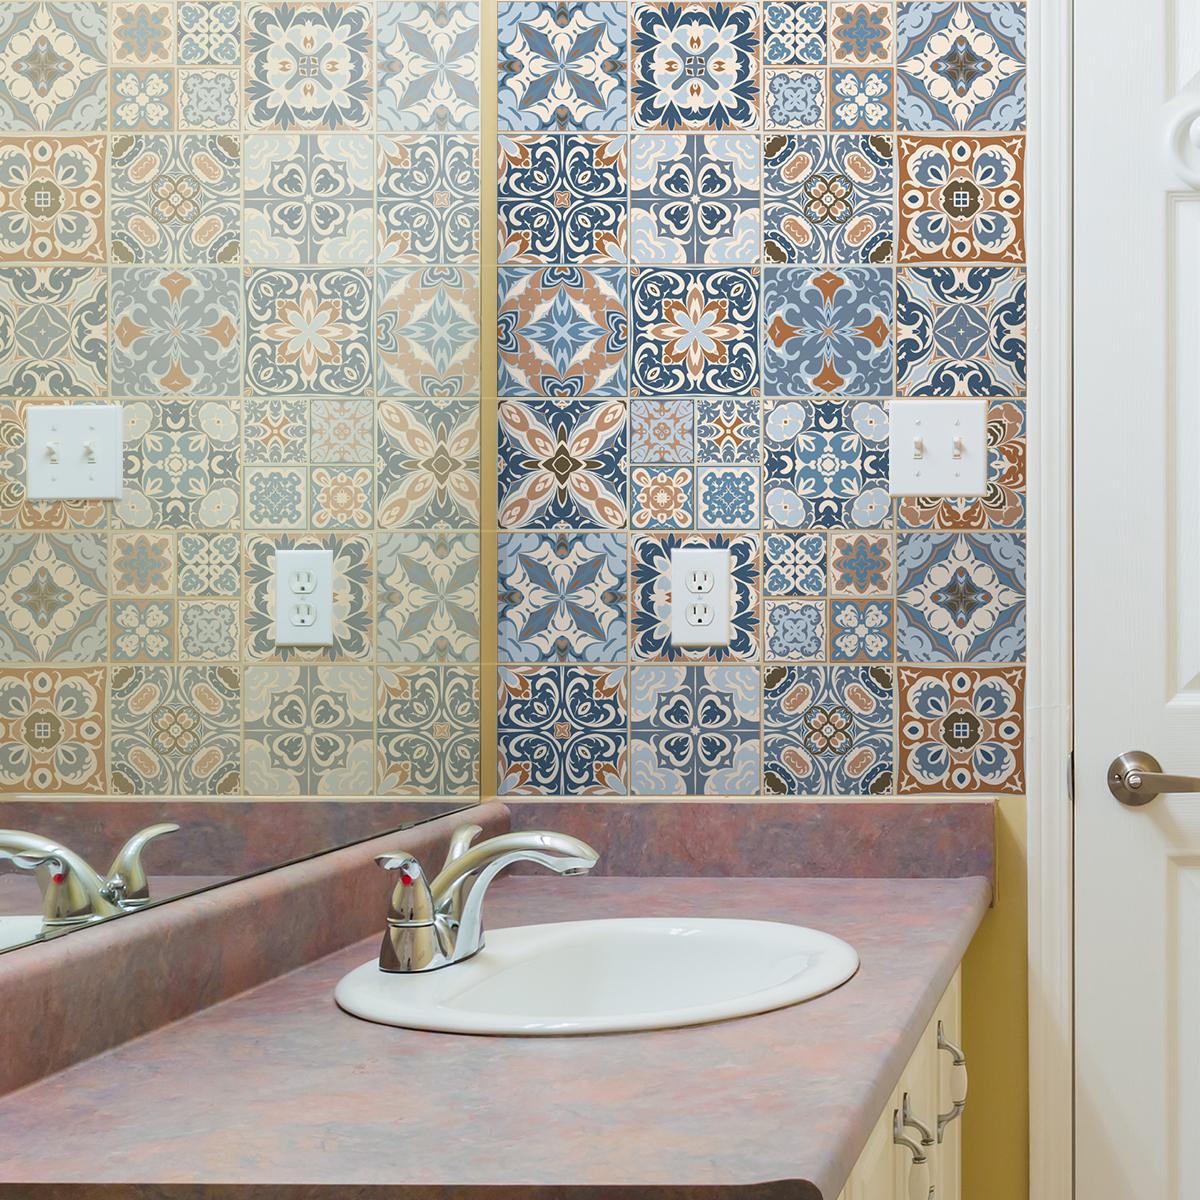 24 stickers carreaux de ciment azulejos albano cuisine - Carreaux de ciment stickers ...